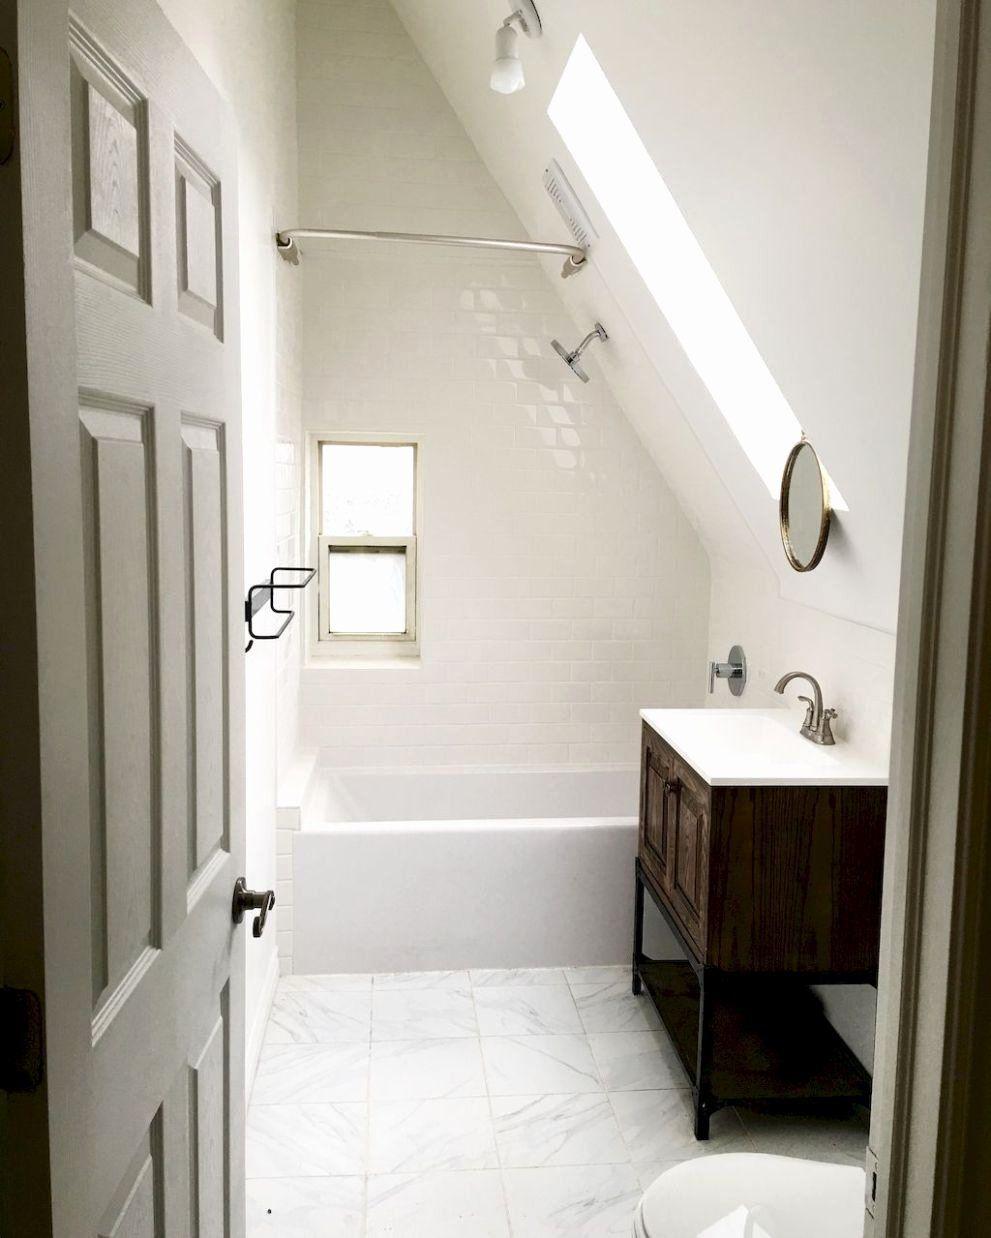 Attic Bathroom Ideas Sloped Ceiling Fresh 10 Creative attic